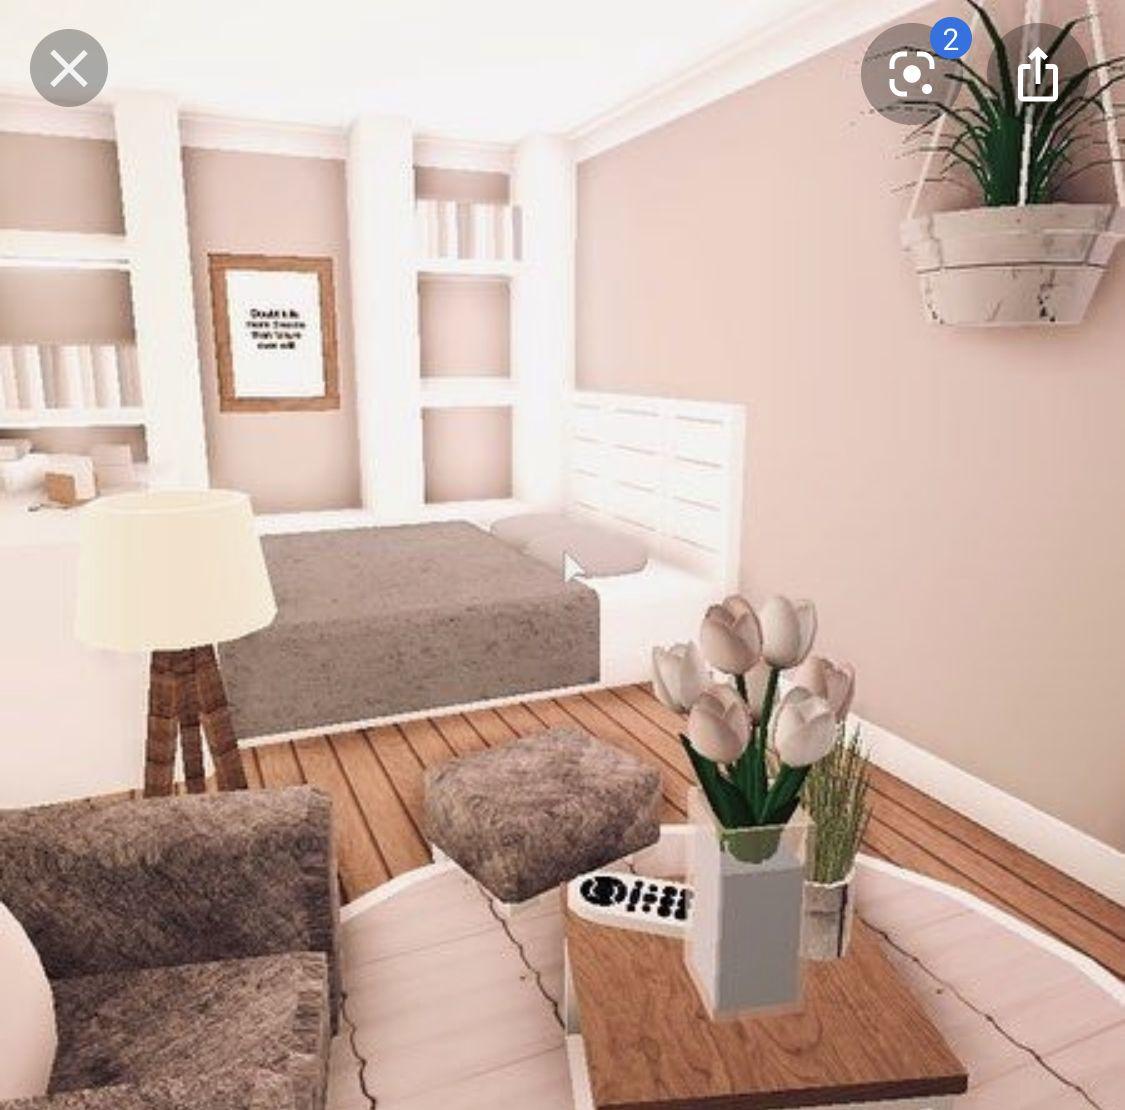 Aesthetic Bloxburg Boy Bedroom Ideas - Viral and Trend